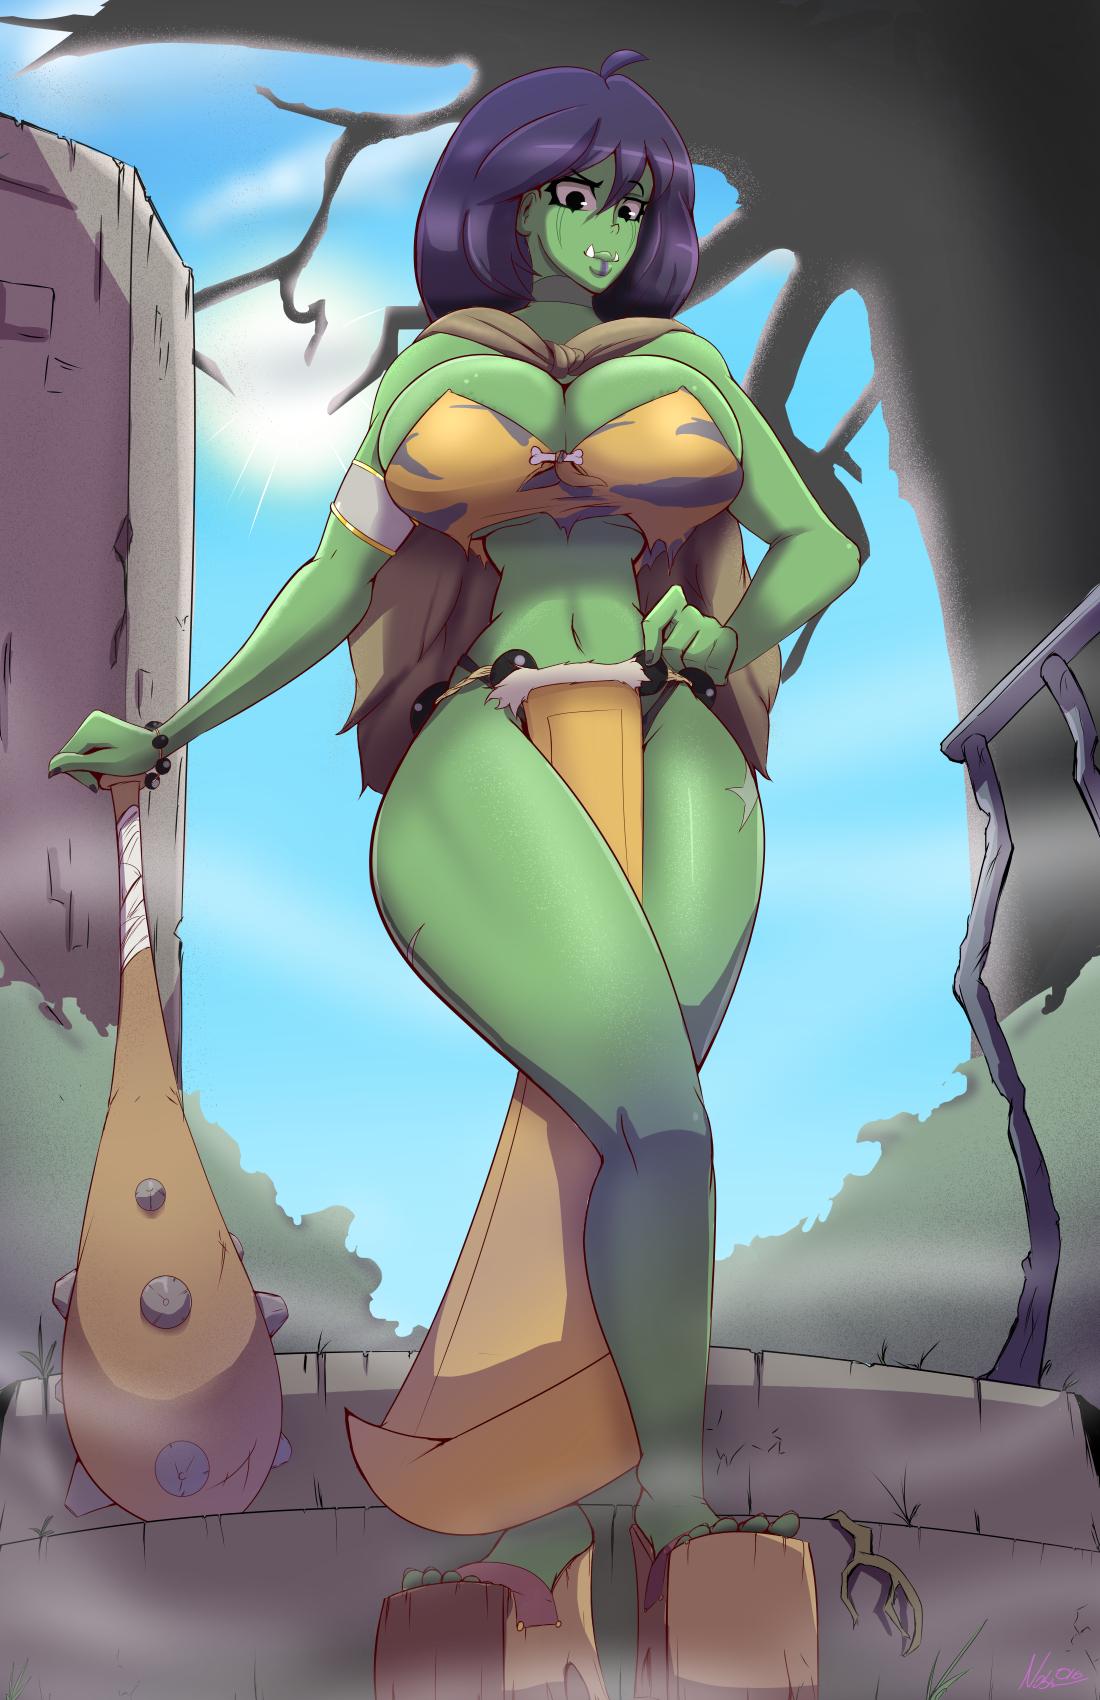 The Orc Princess